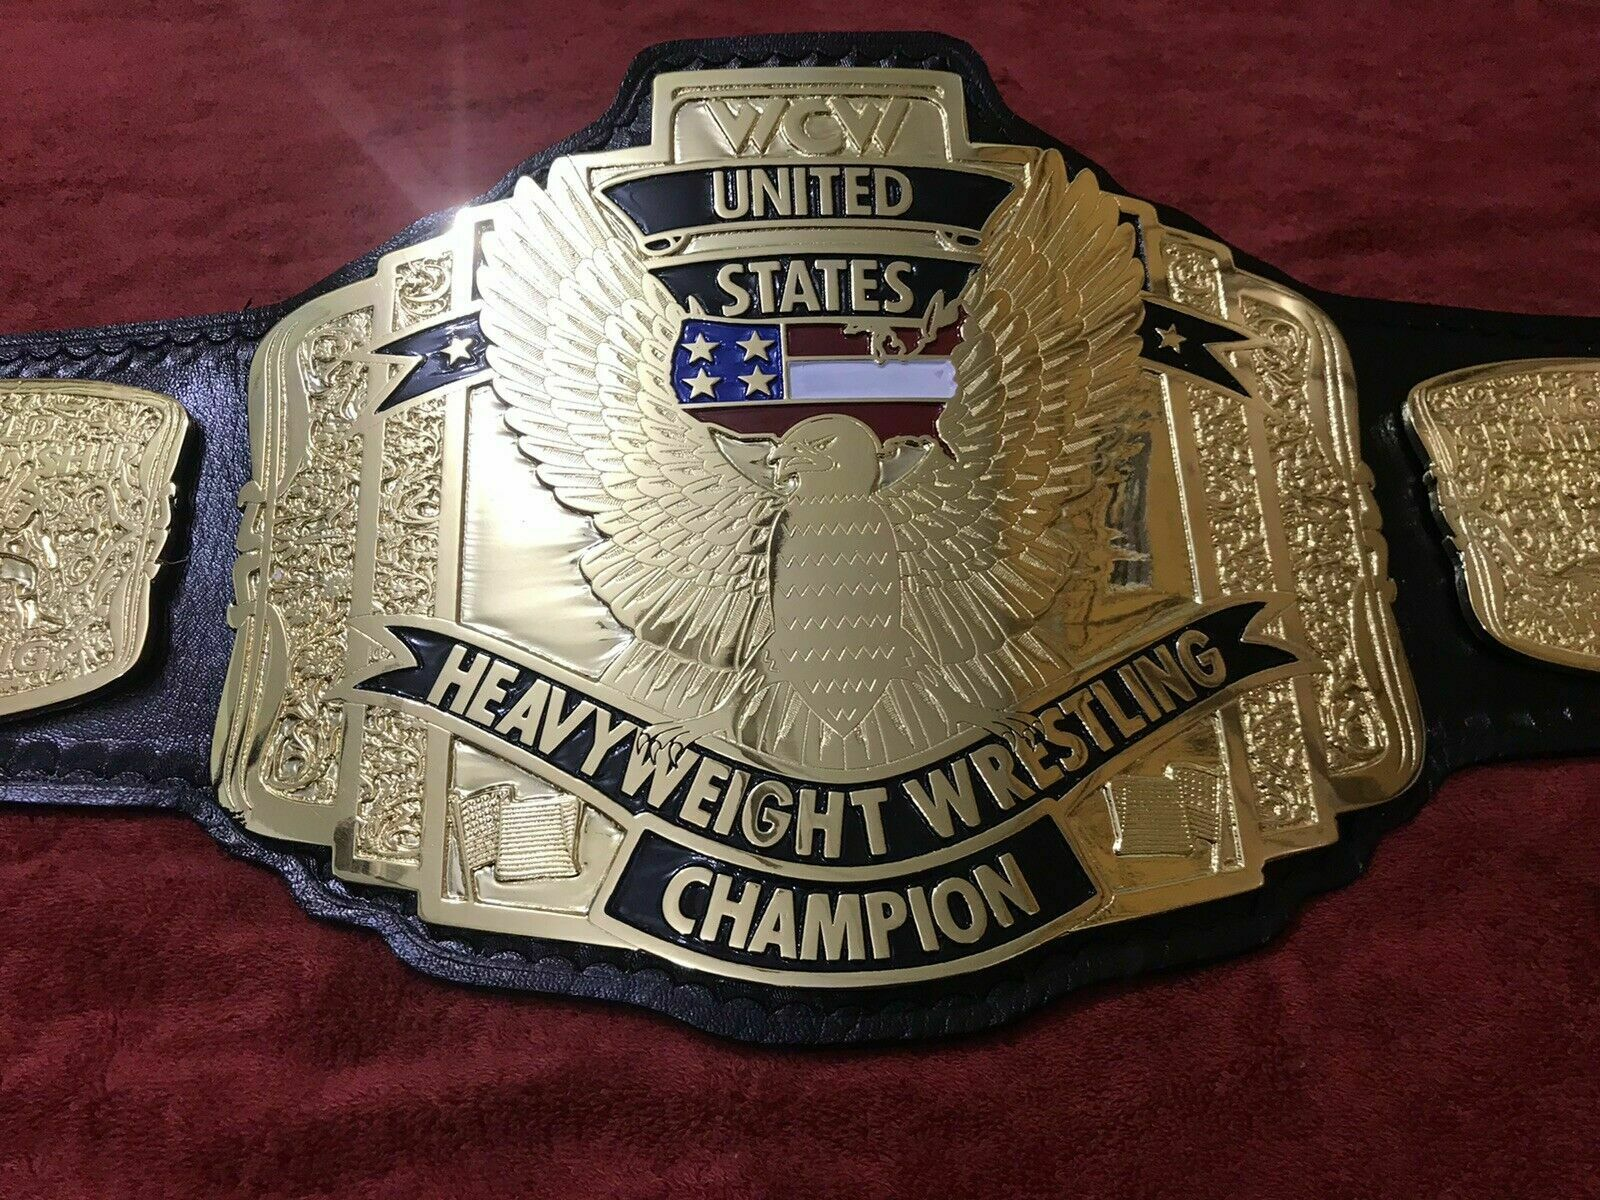 WCW United States Heavyweight Wrestling Championship Belt - $325